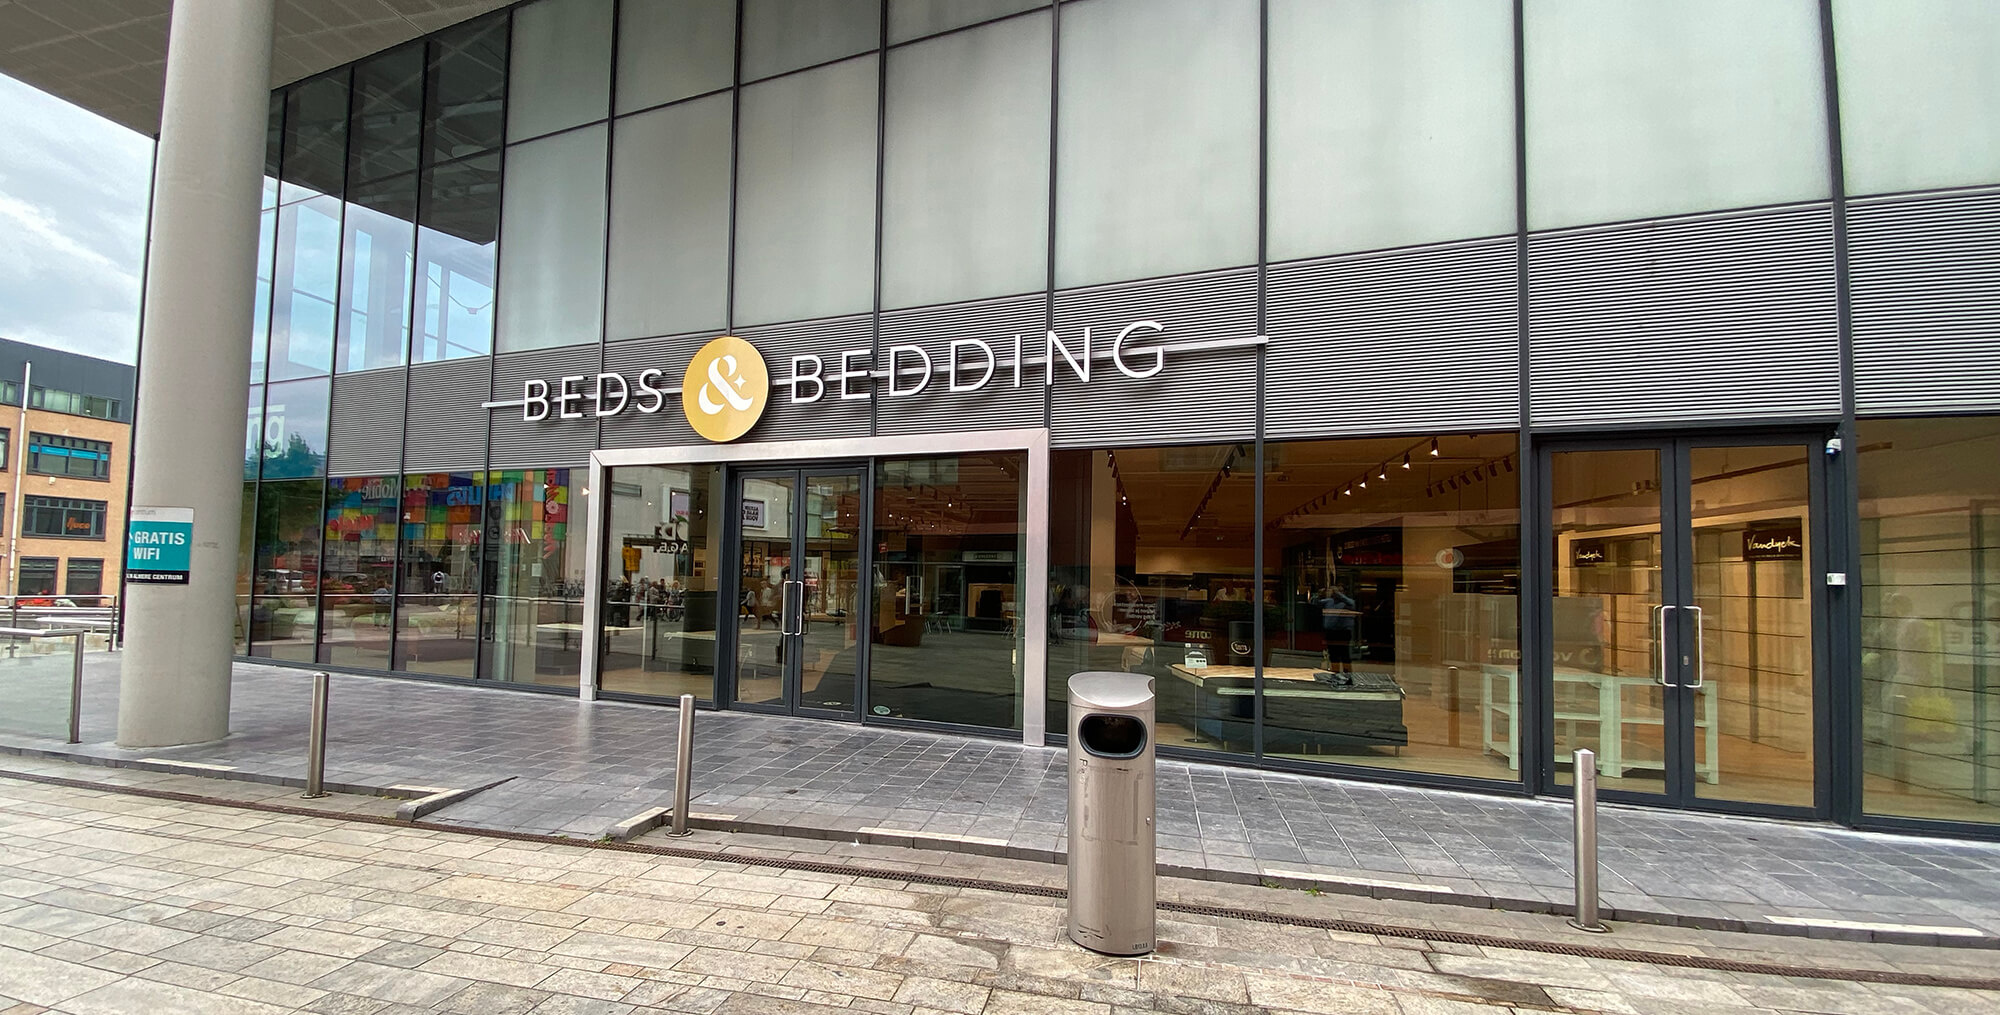 Beds & Bedding Almere